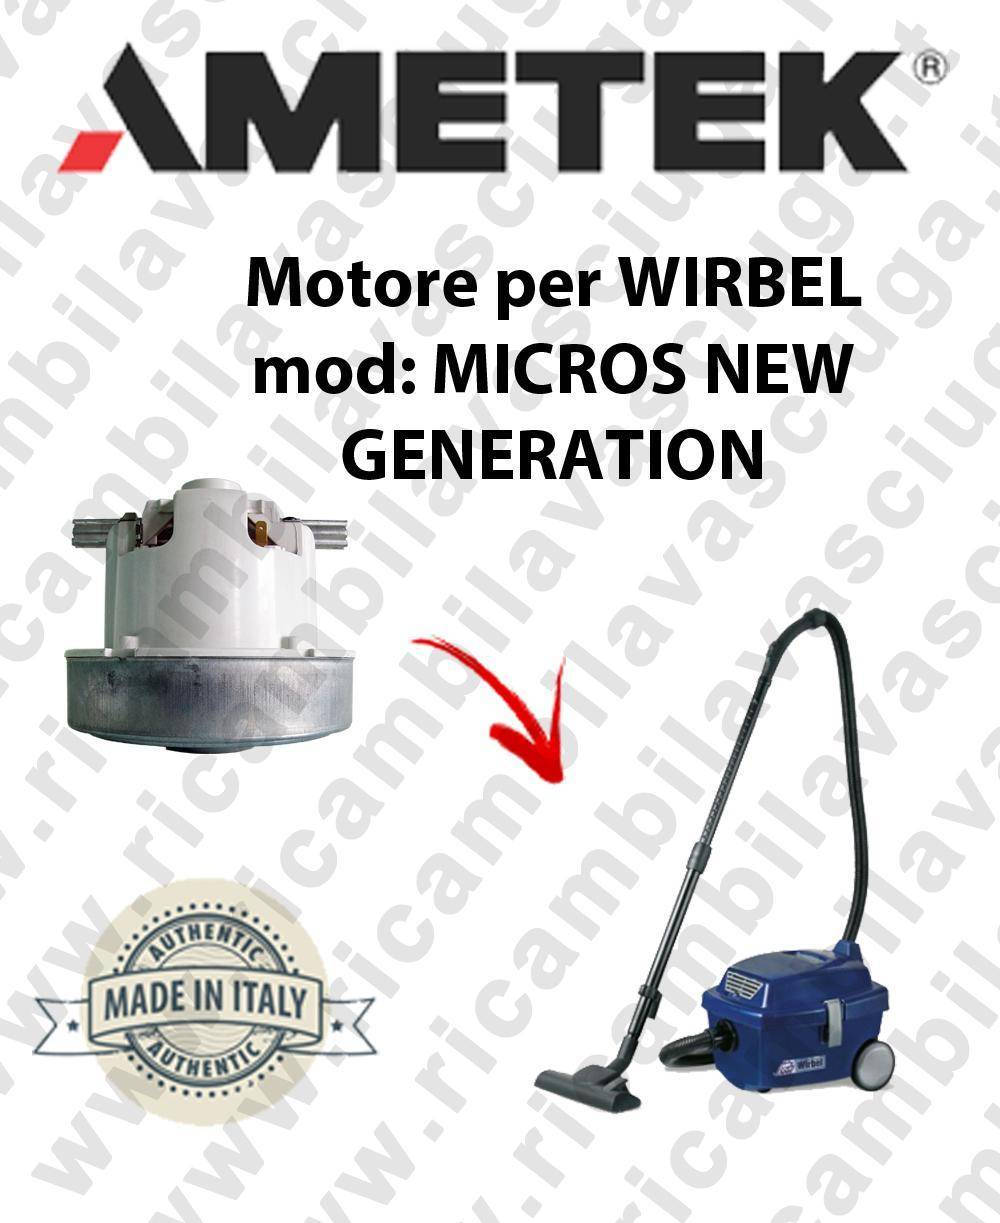 wirbel motore aspirazione ametek per aspirapolvere mikros new generation